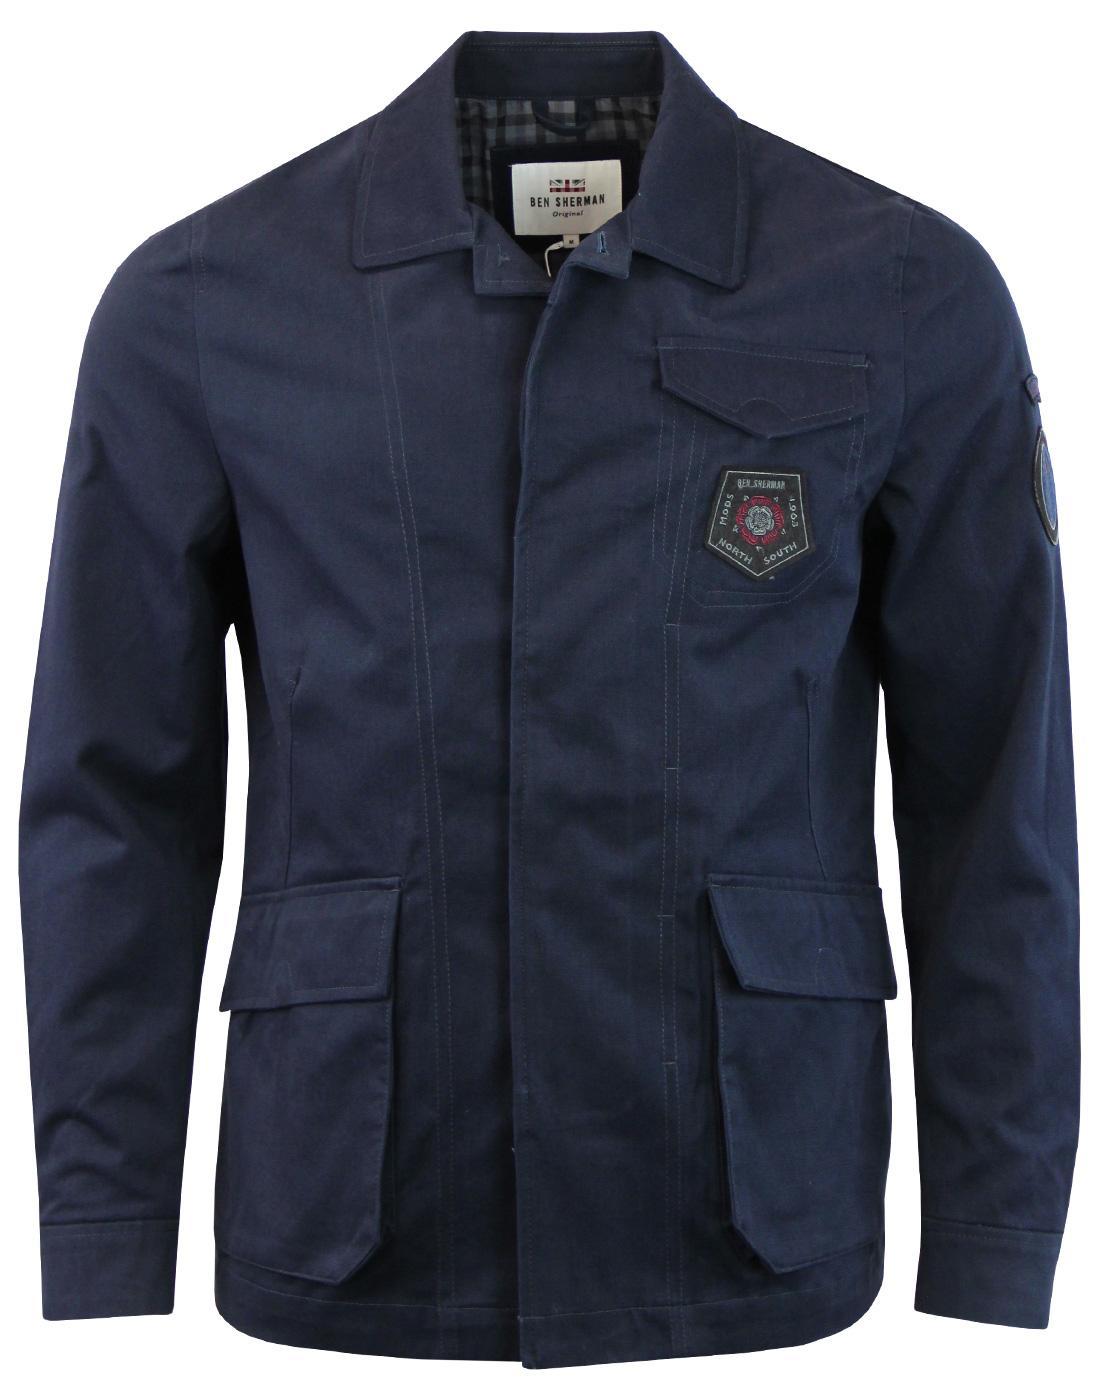 BEN SHERMAN 60s Mod Military Twill Badged Jacket C